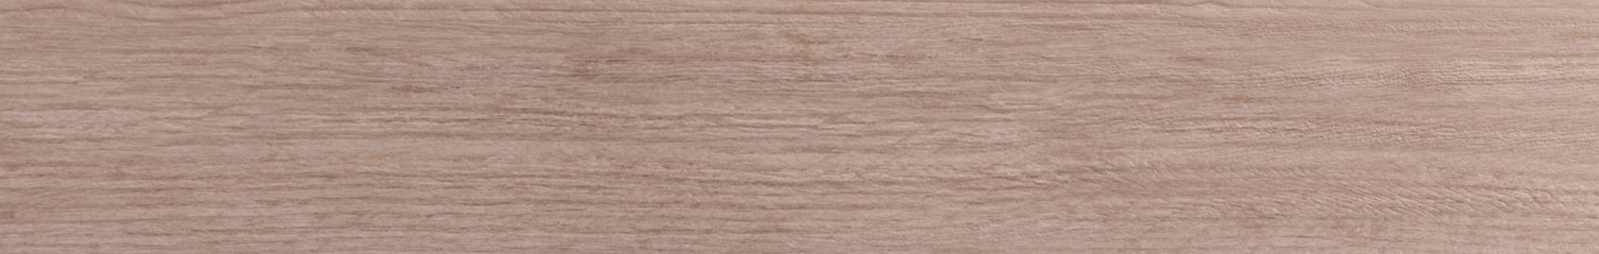 Напольная плитка Venis Hampton +14160 Beige 14,3х90 цены